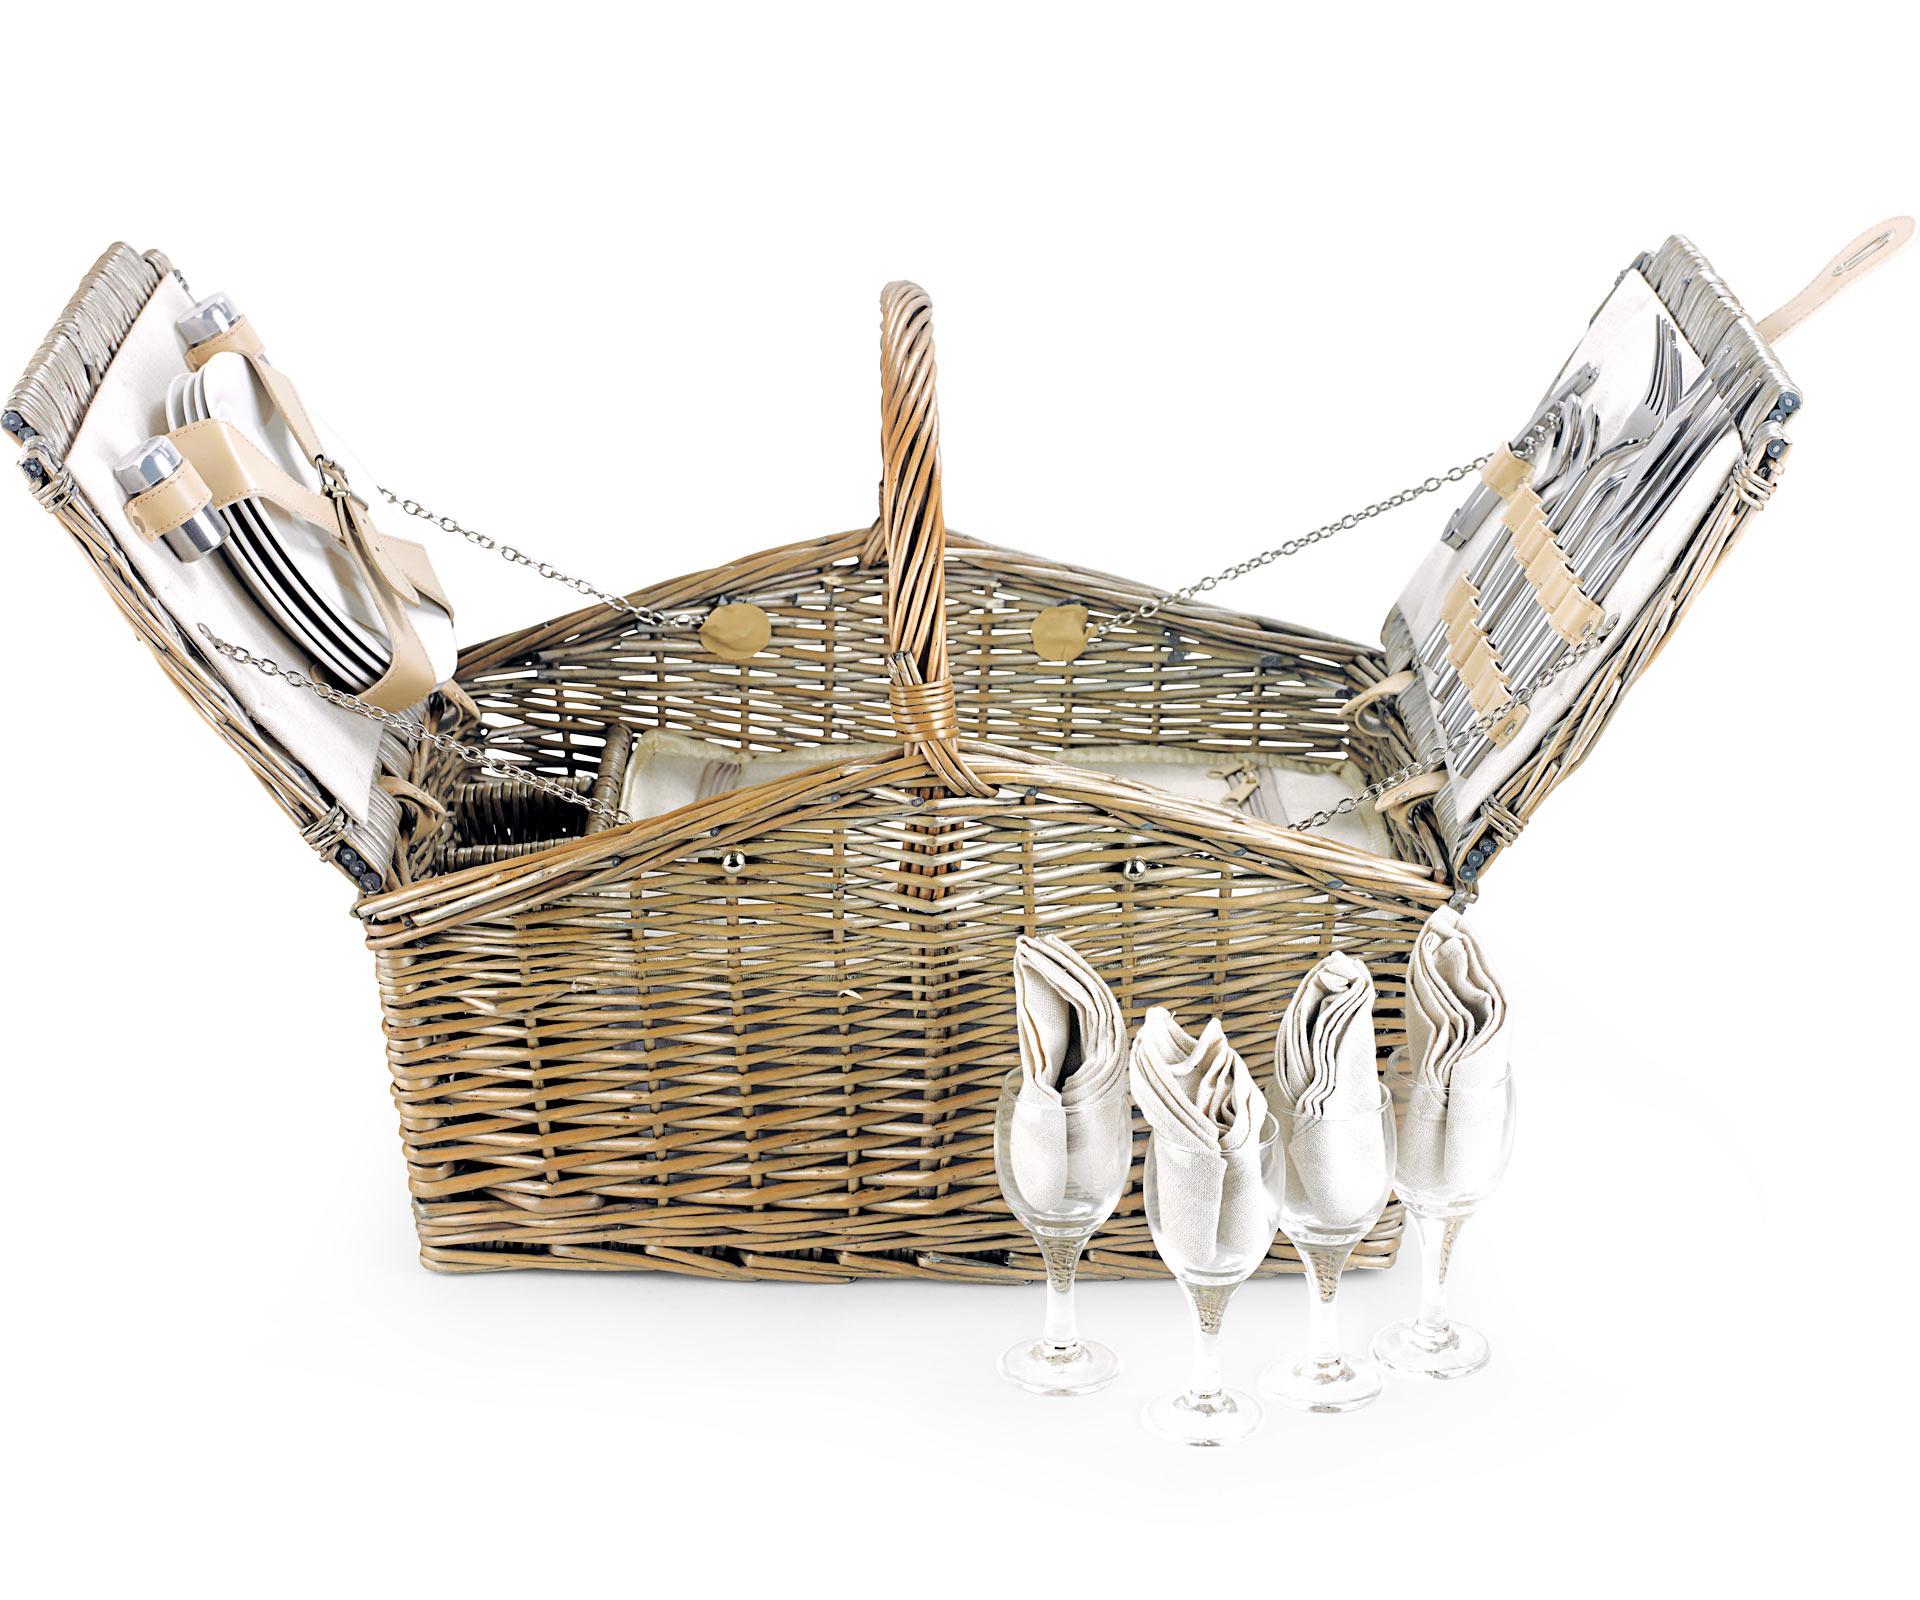 Empty Picnic Basket, Double-Lid Hamper